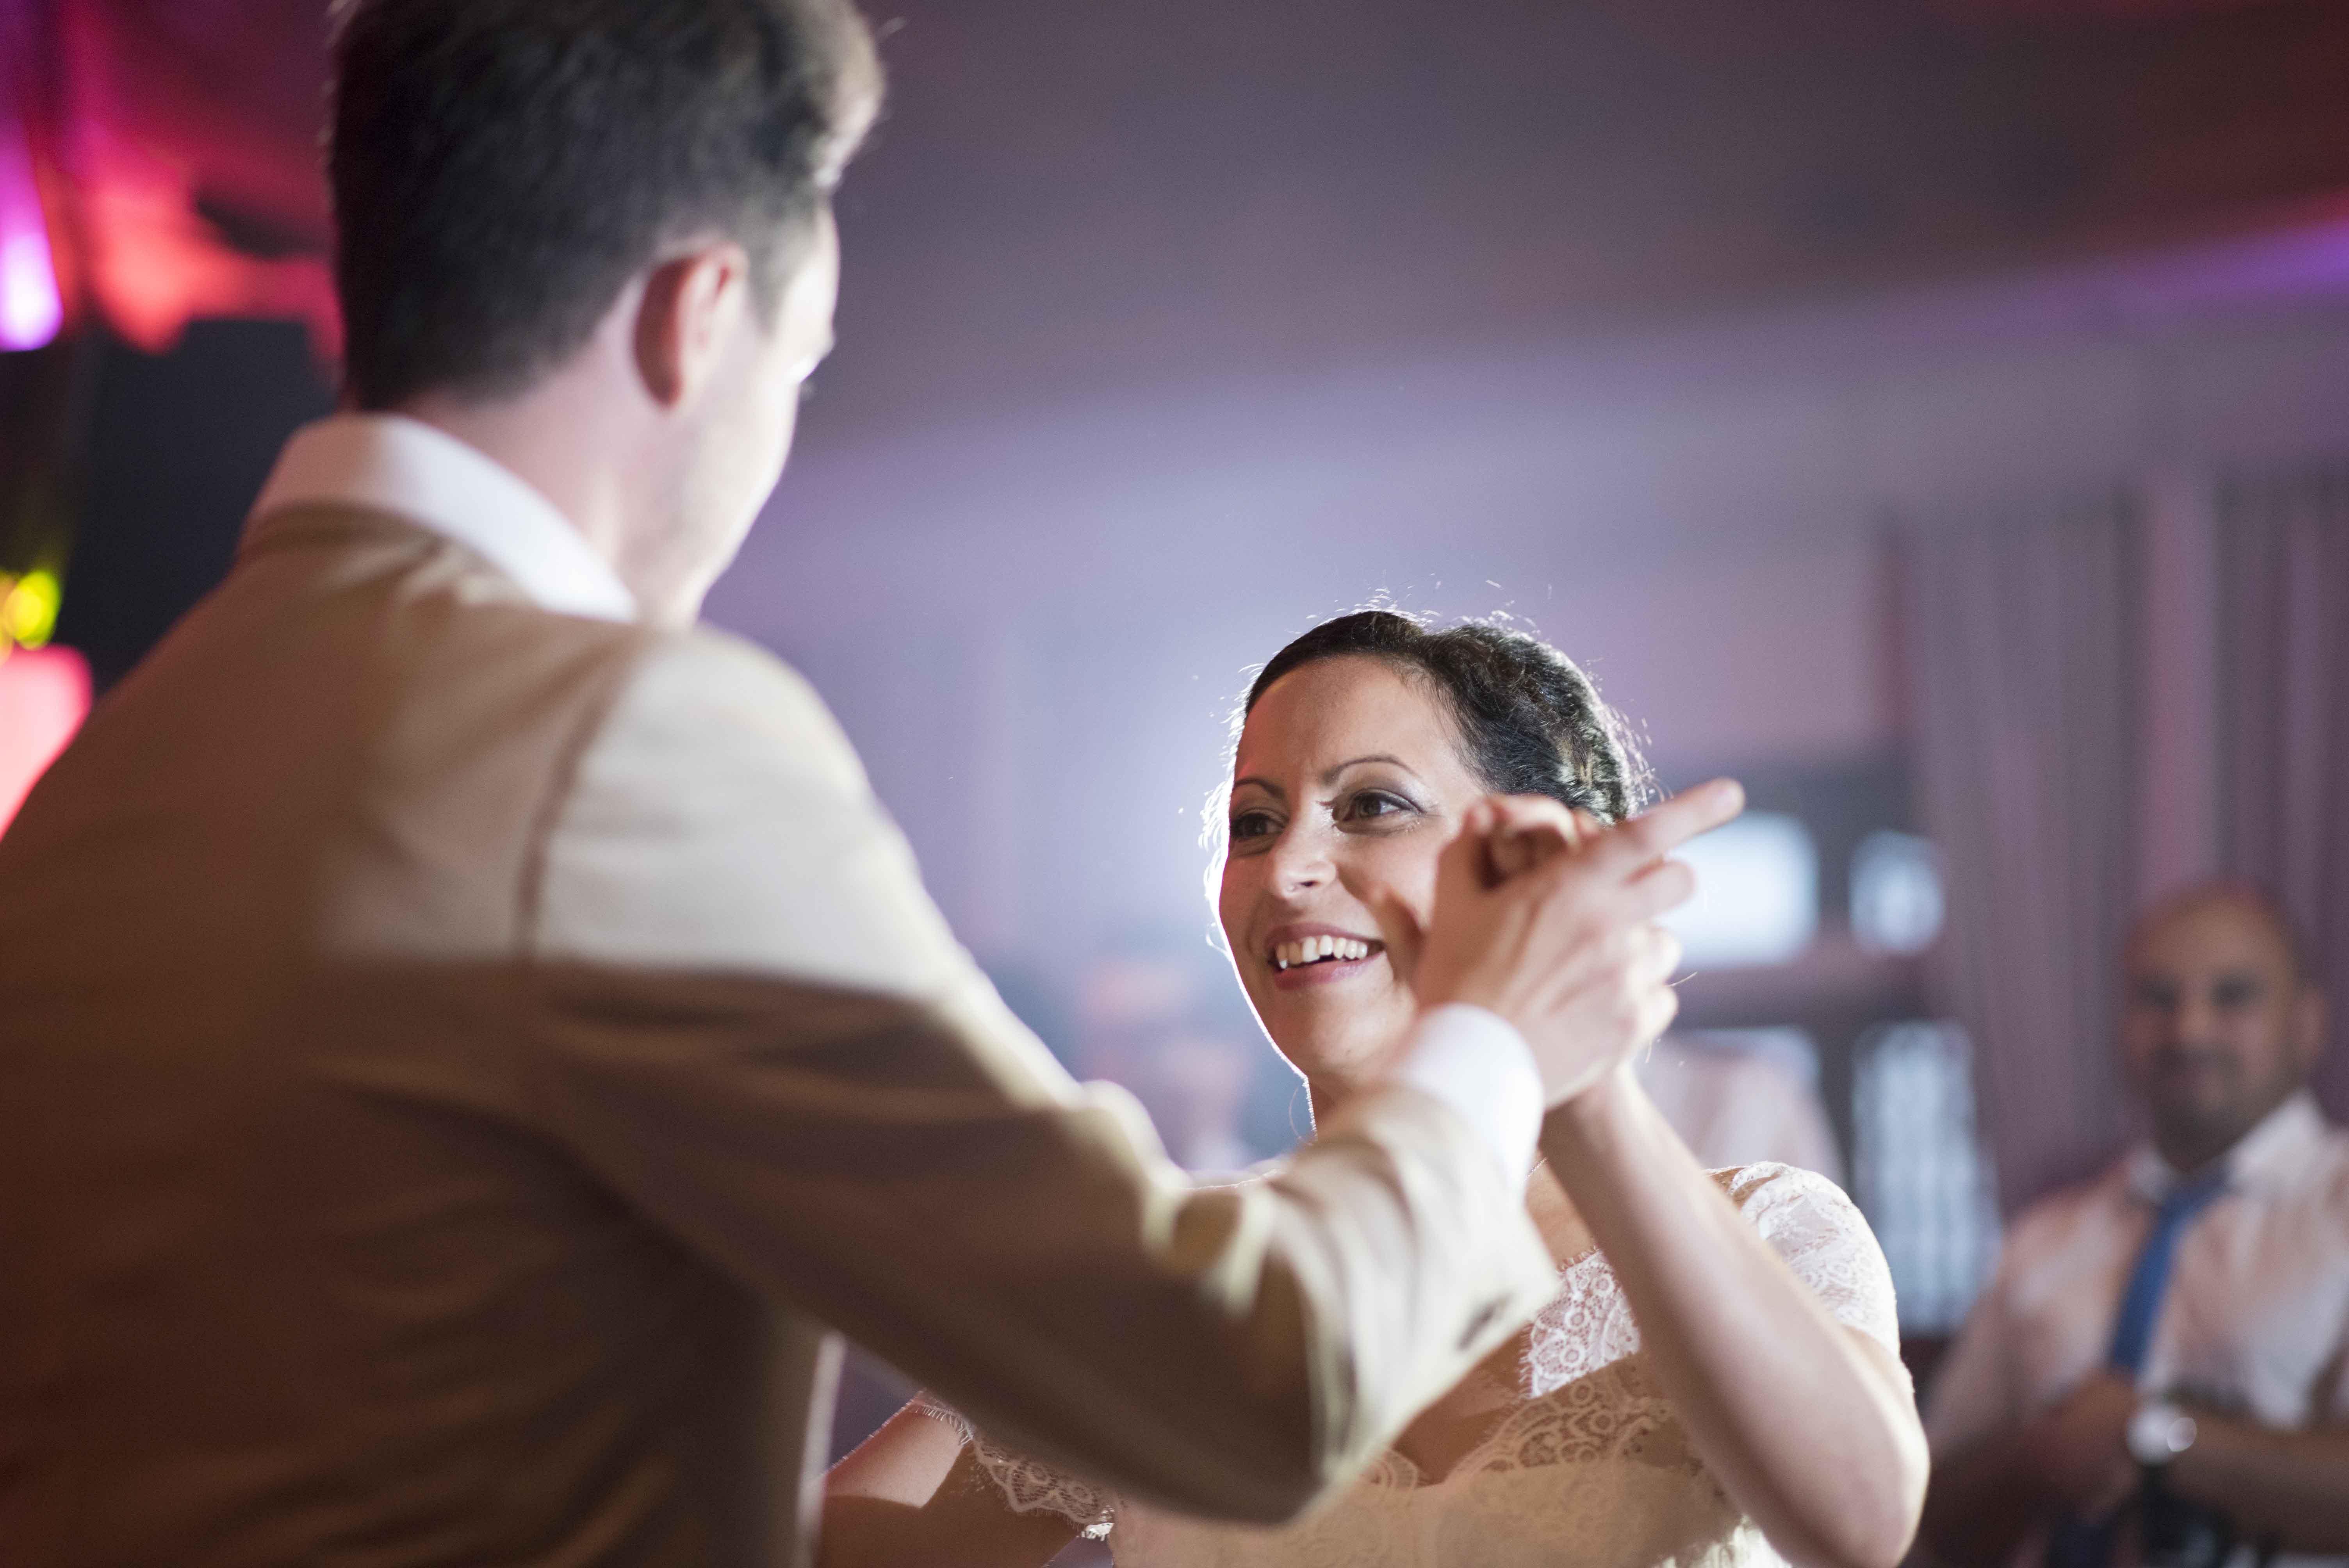 Wedding Photo (1060) copy